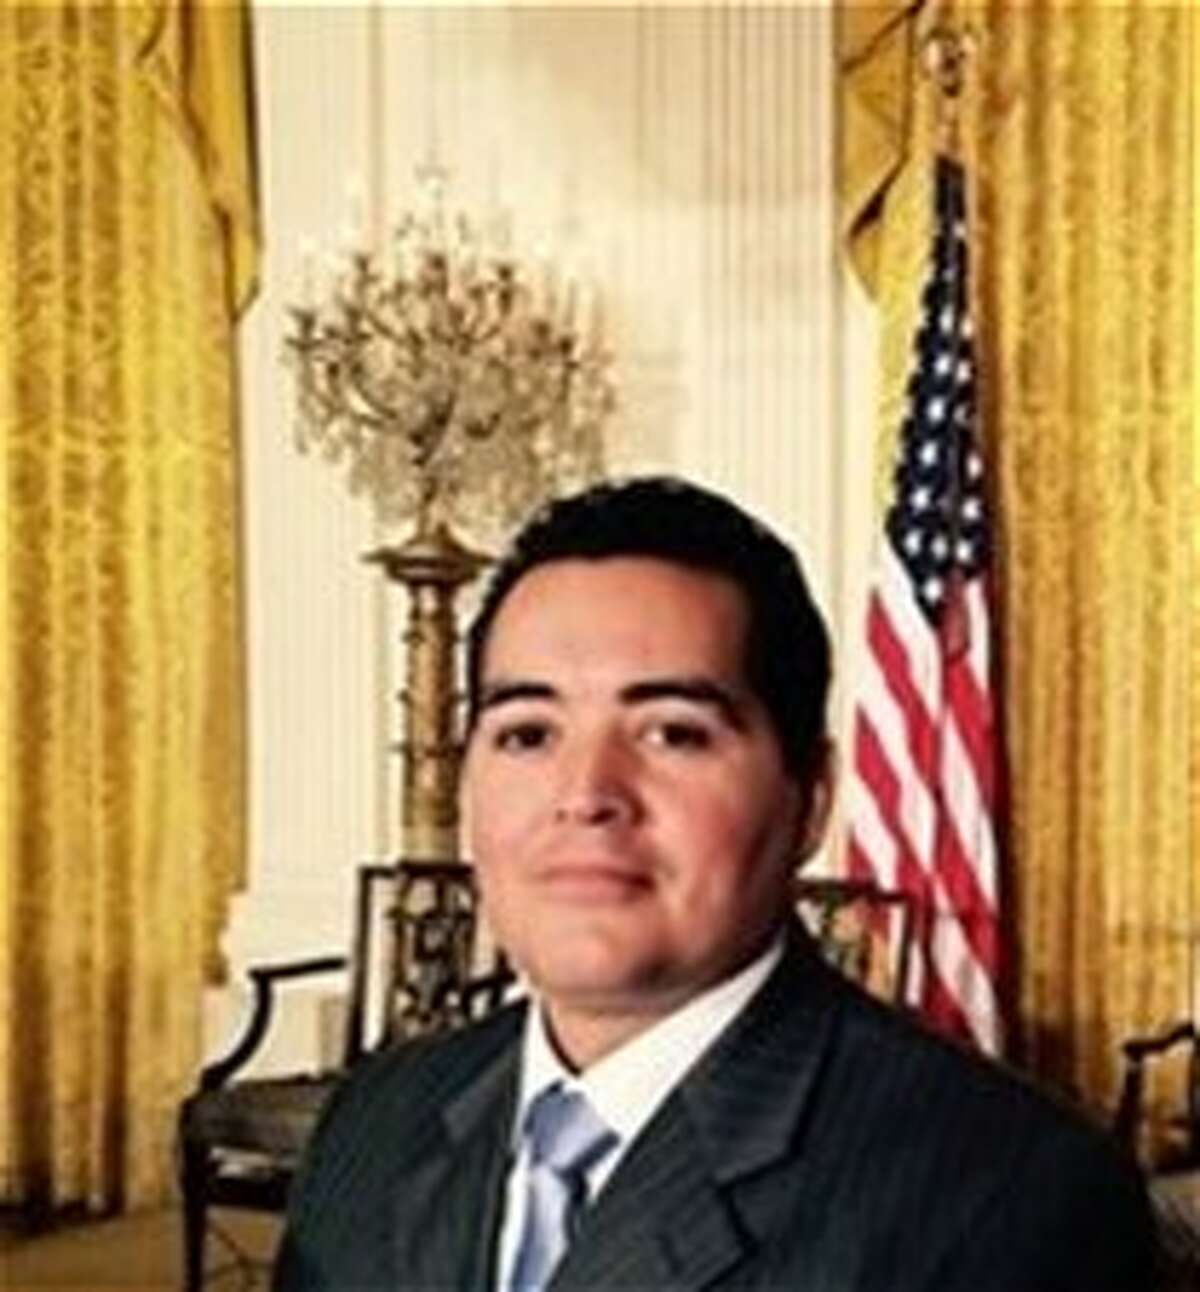 Crystal City Mayor Ricardo Lopez